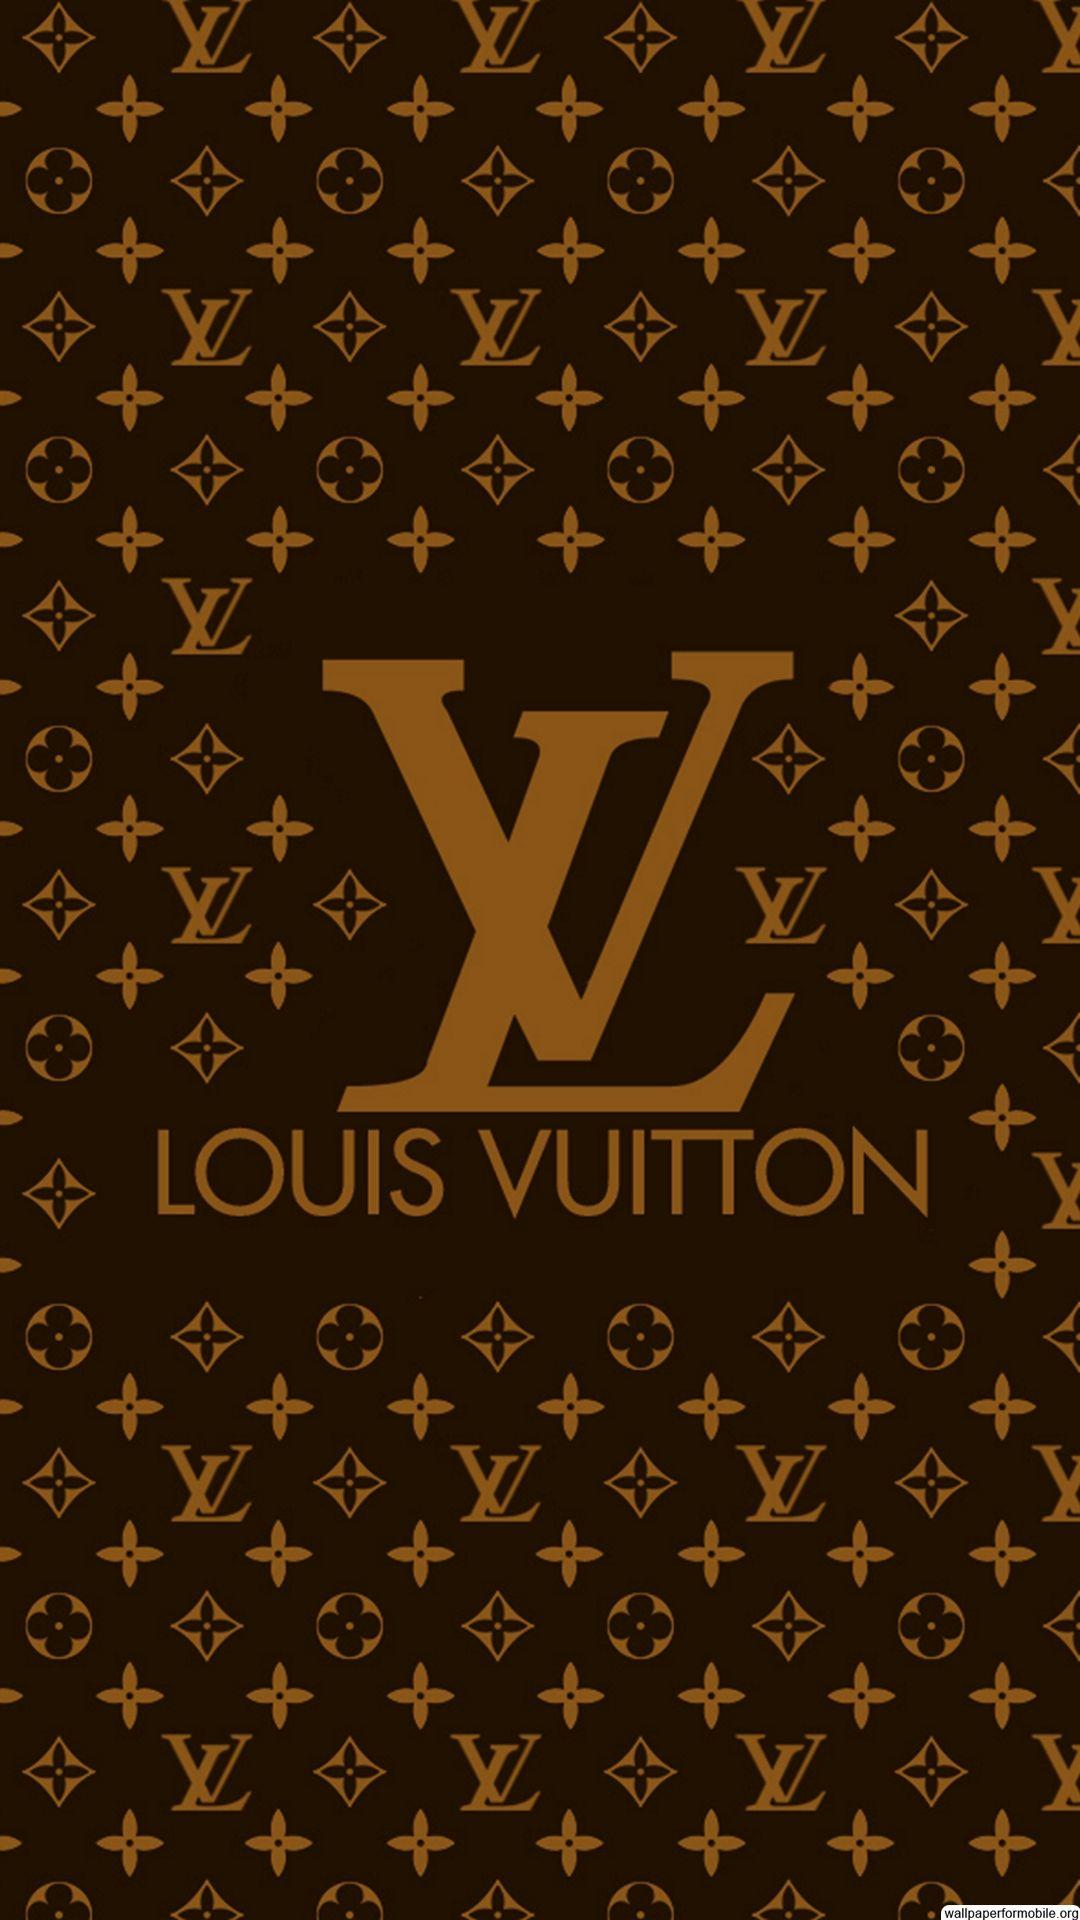 Free Louis Vuitton Wallpapers Wallpaper For Mobile Louis Vuitton Iphone Wallpaper Louis Vuitton Perfume Louis Vuitton